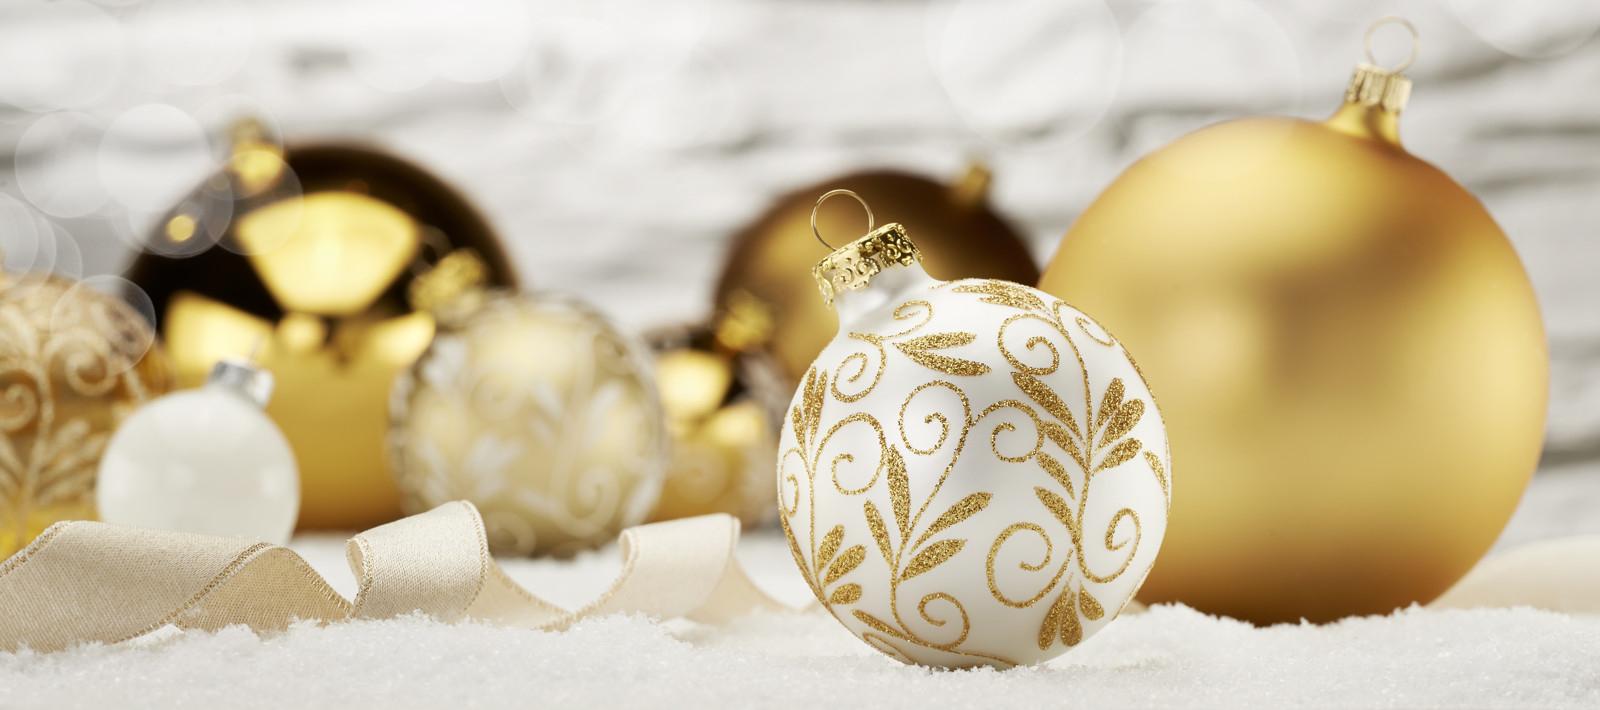 [Rödentaler] Jetzt 40% Rabatt auf alle Weihnachtskugeln! VSK € 5,99 innerhalb D.